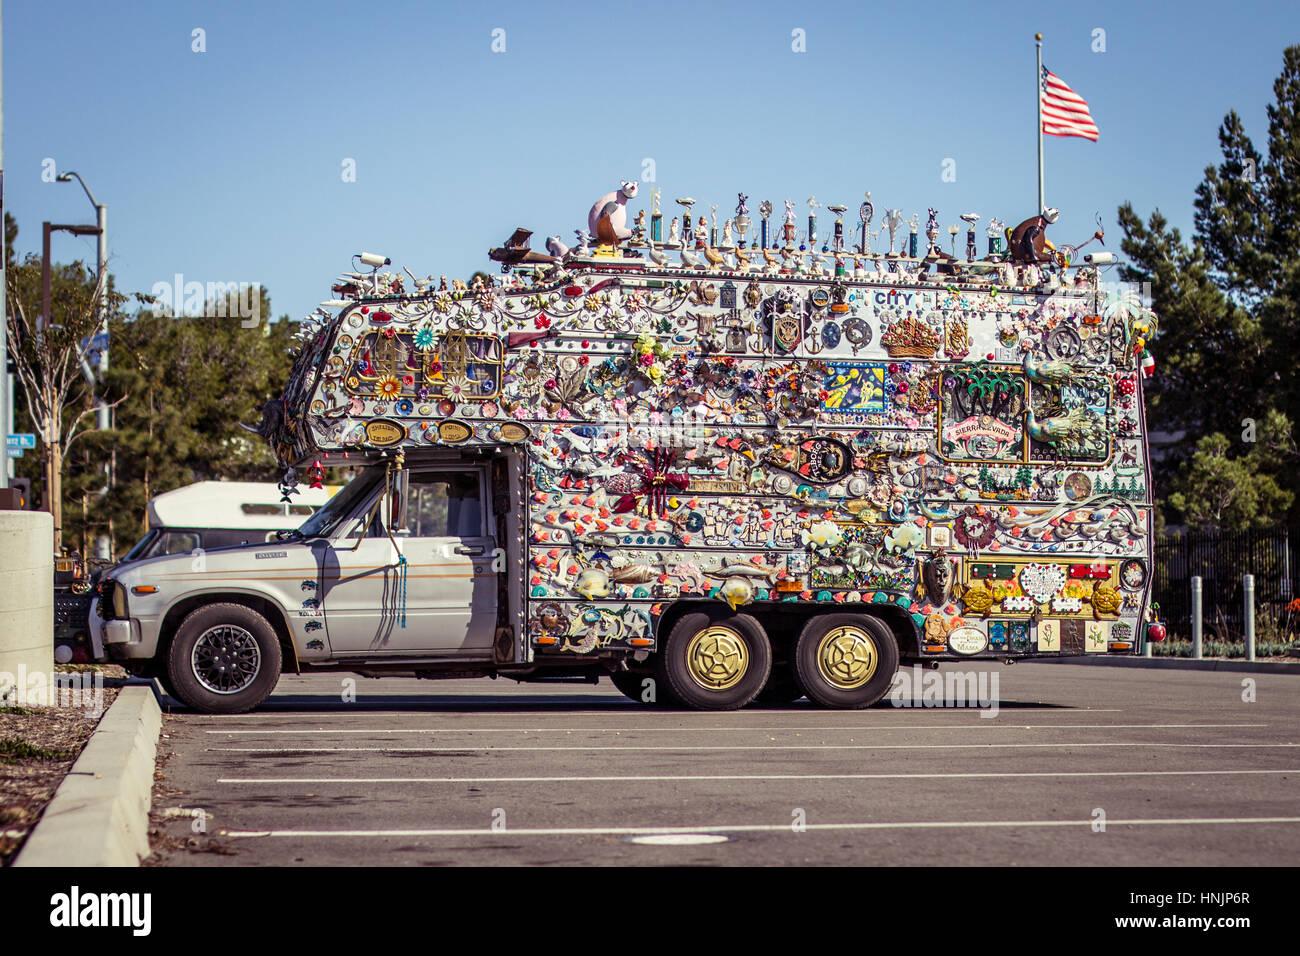 Crazy Decorated Theme parked Truck Car tourist san Diego Sea Port Village - Stock Image